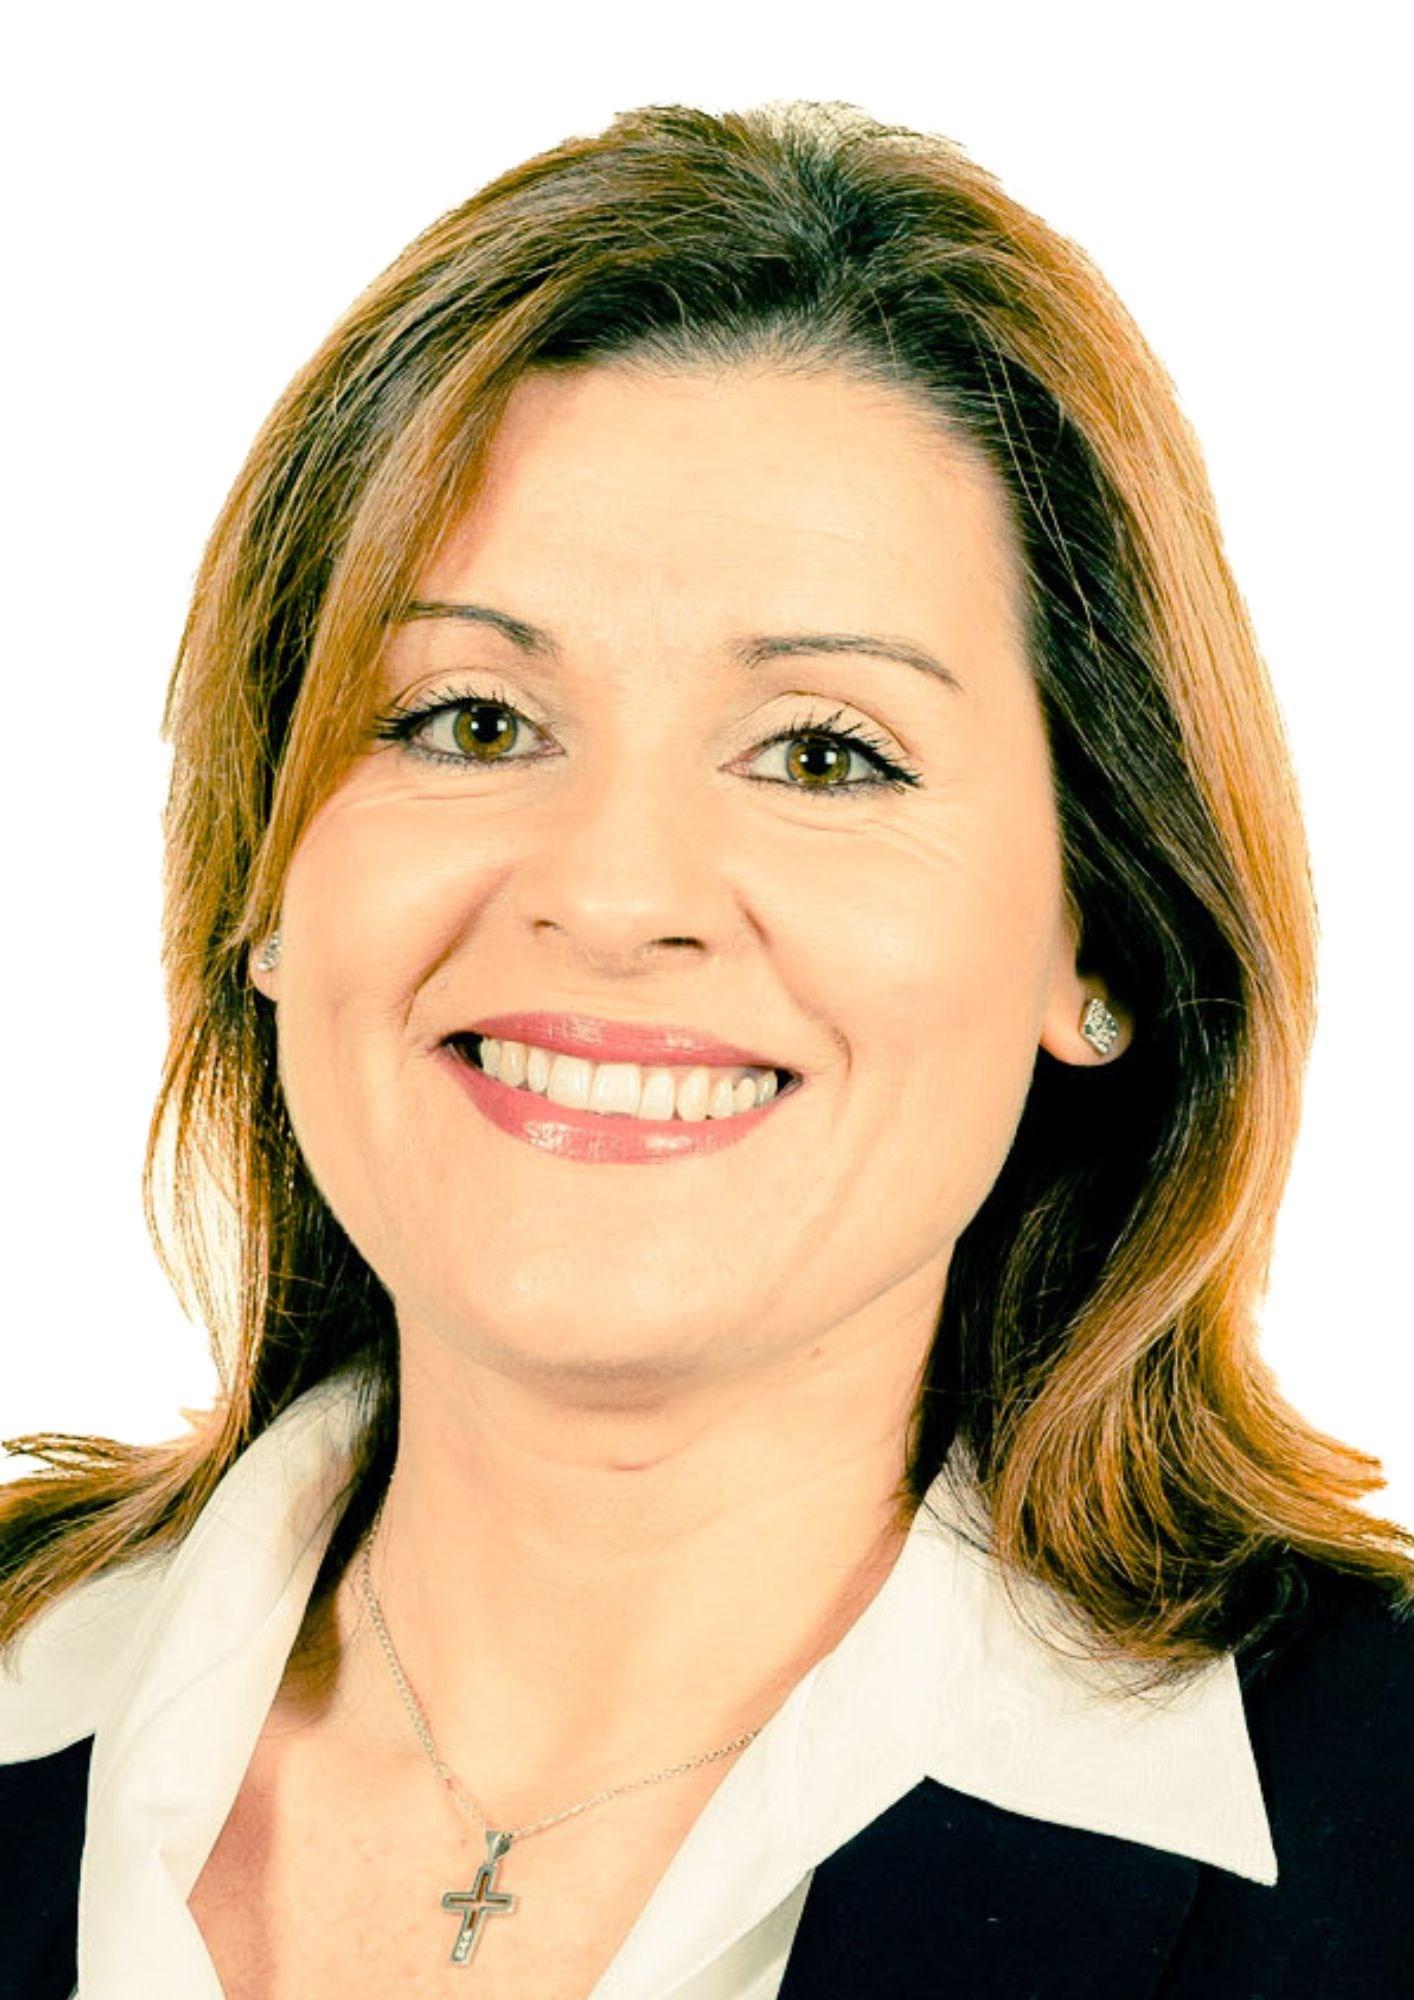 Julia Aroca